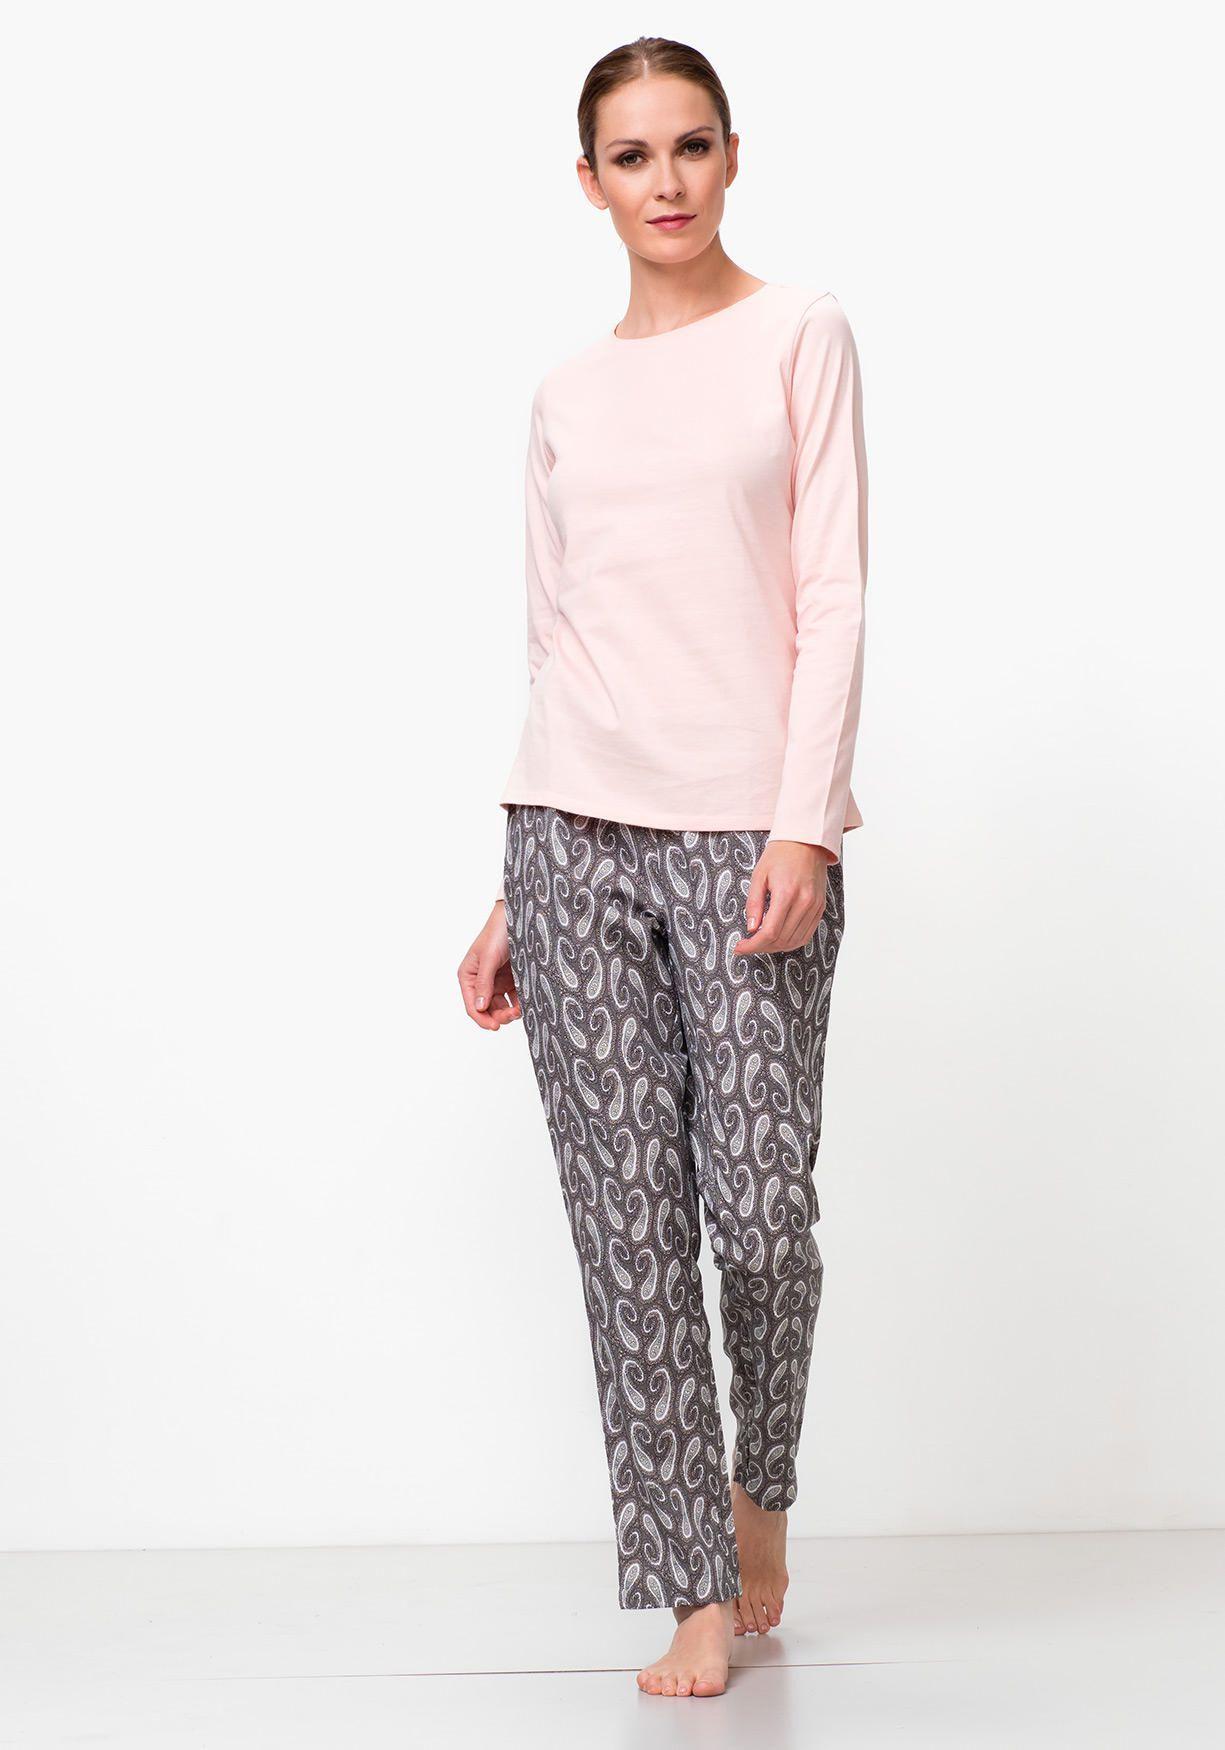 Pijama de mujer combinado manga larga 46972f0c4b9d